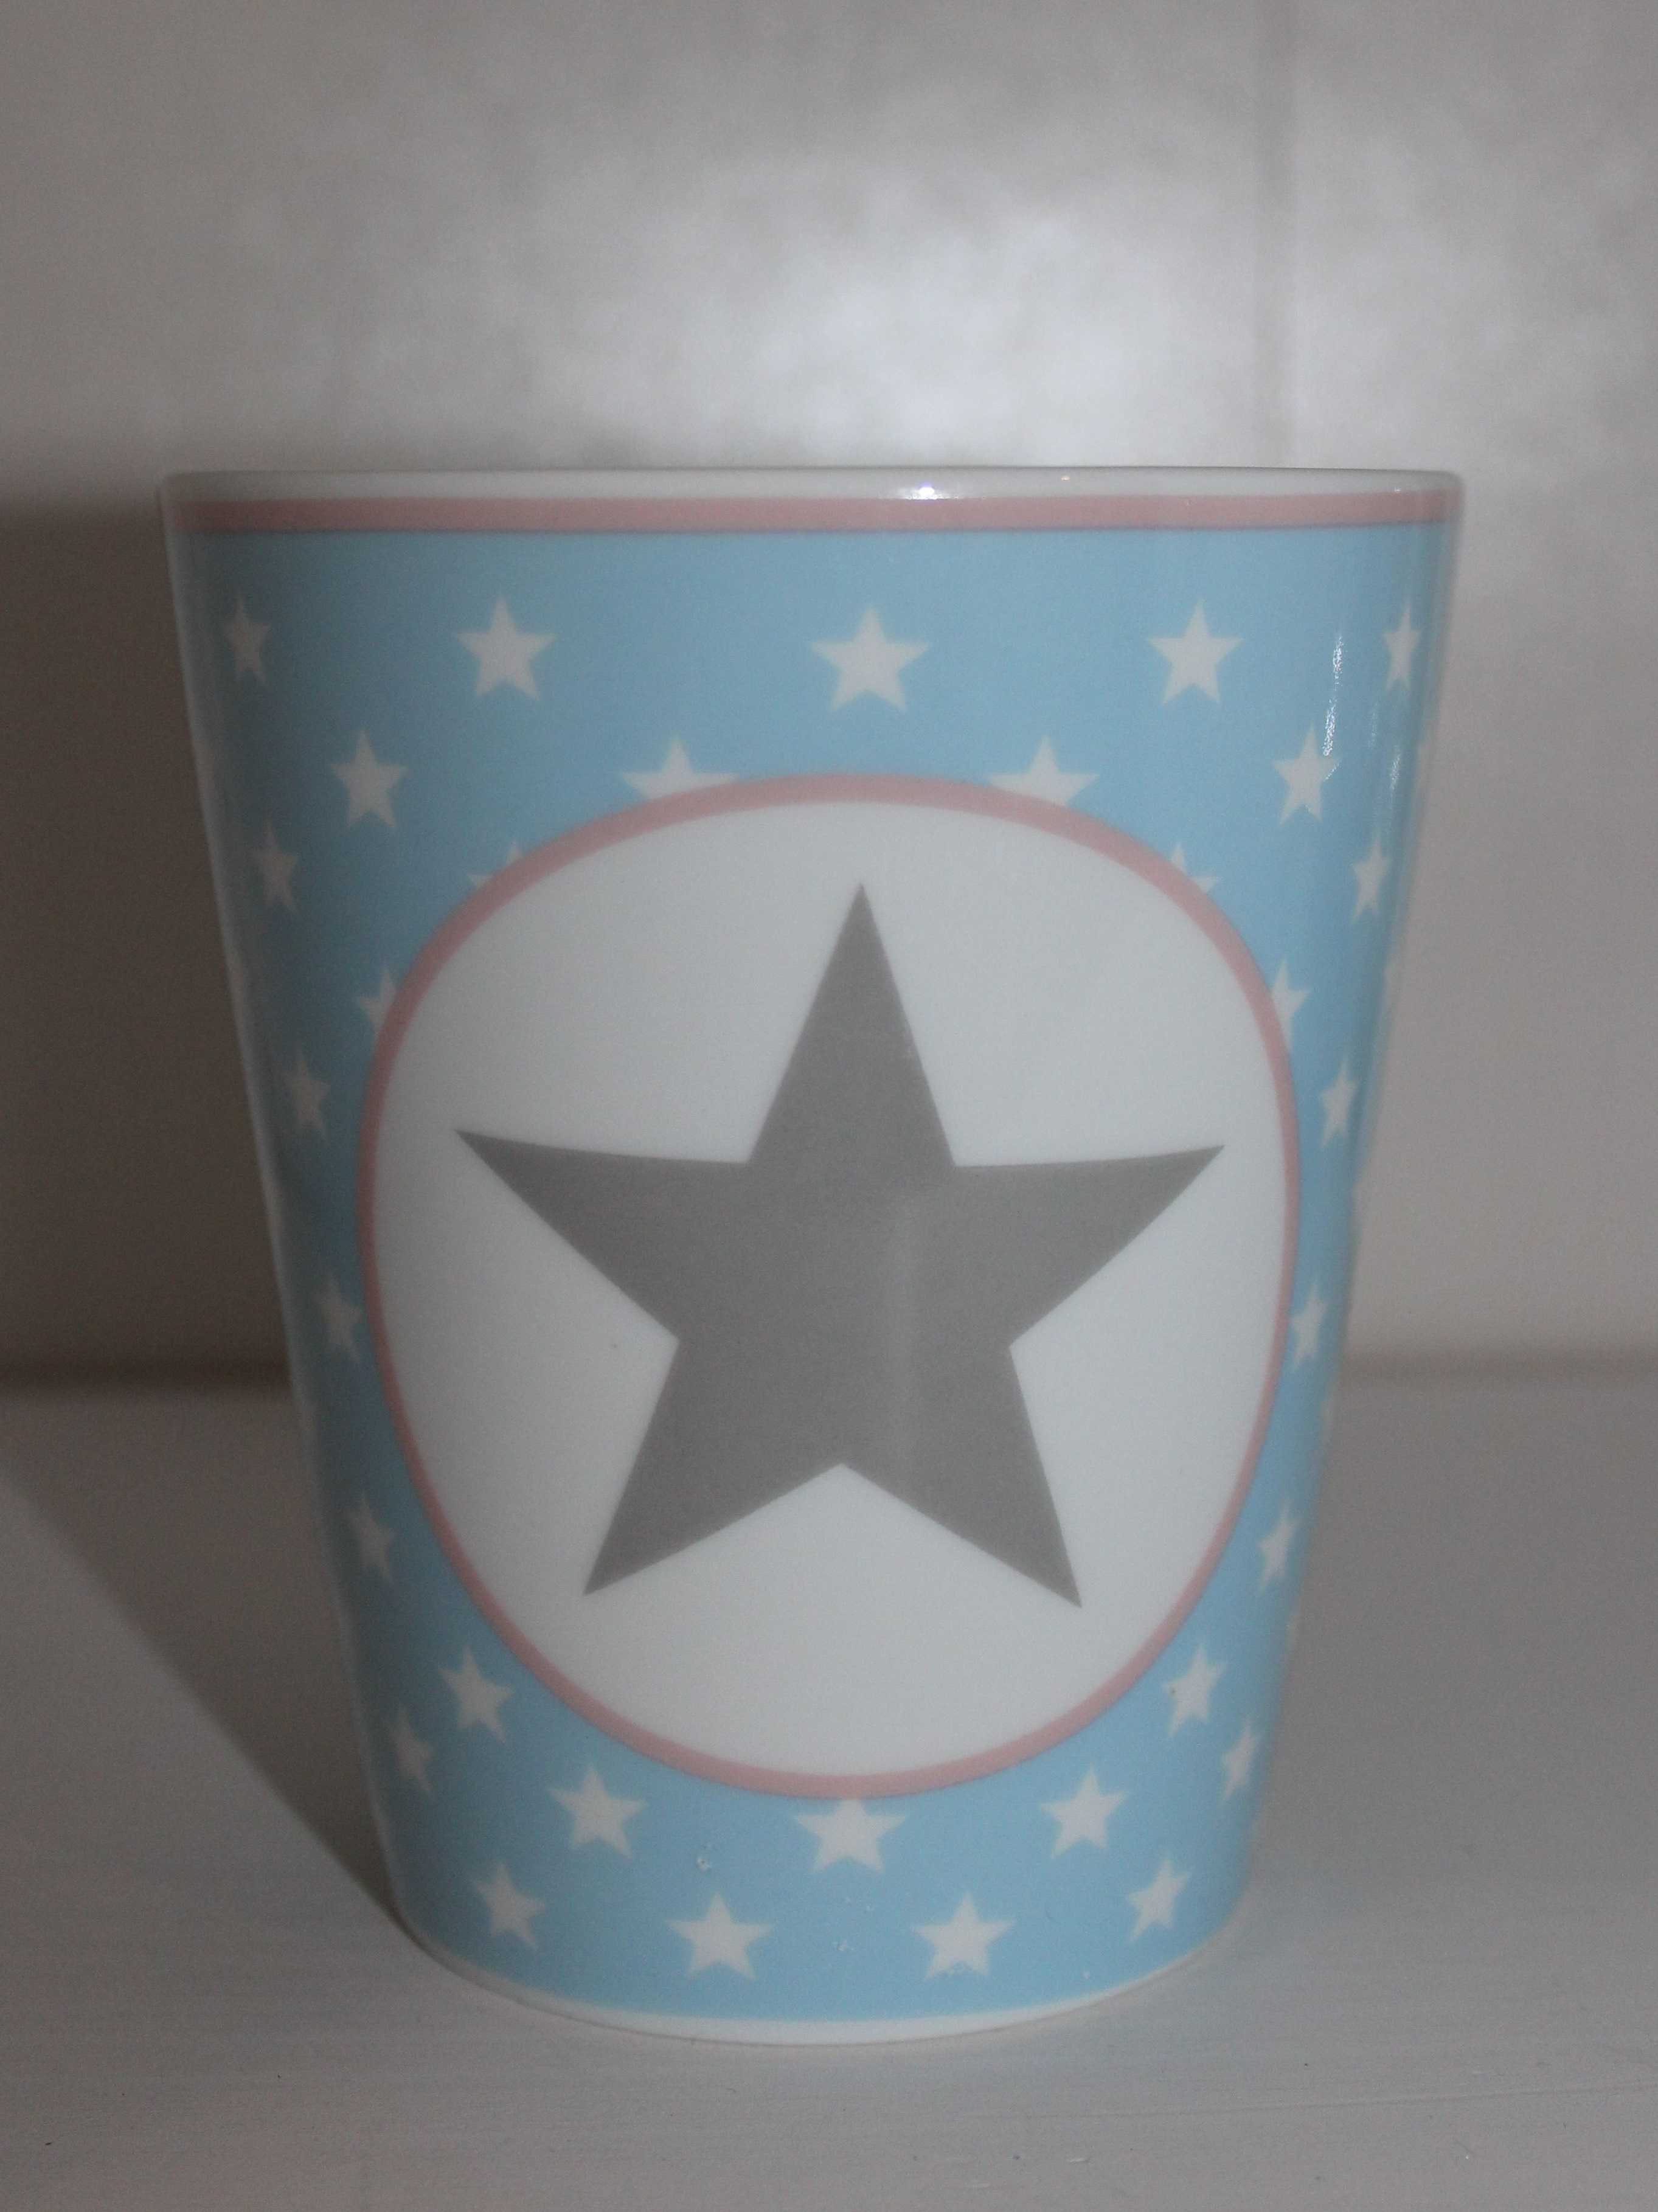 Mug Kaffeebecher hellblau mit grauem Stern